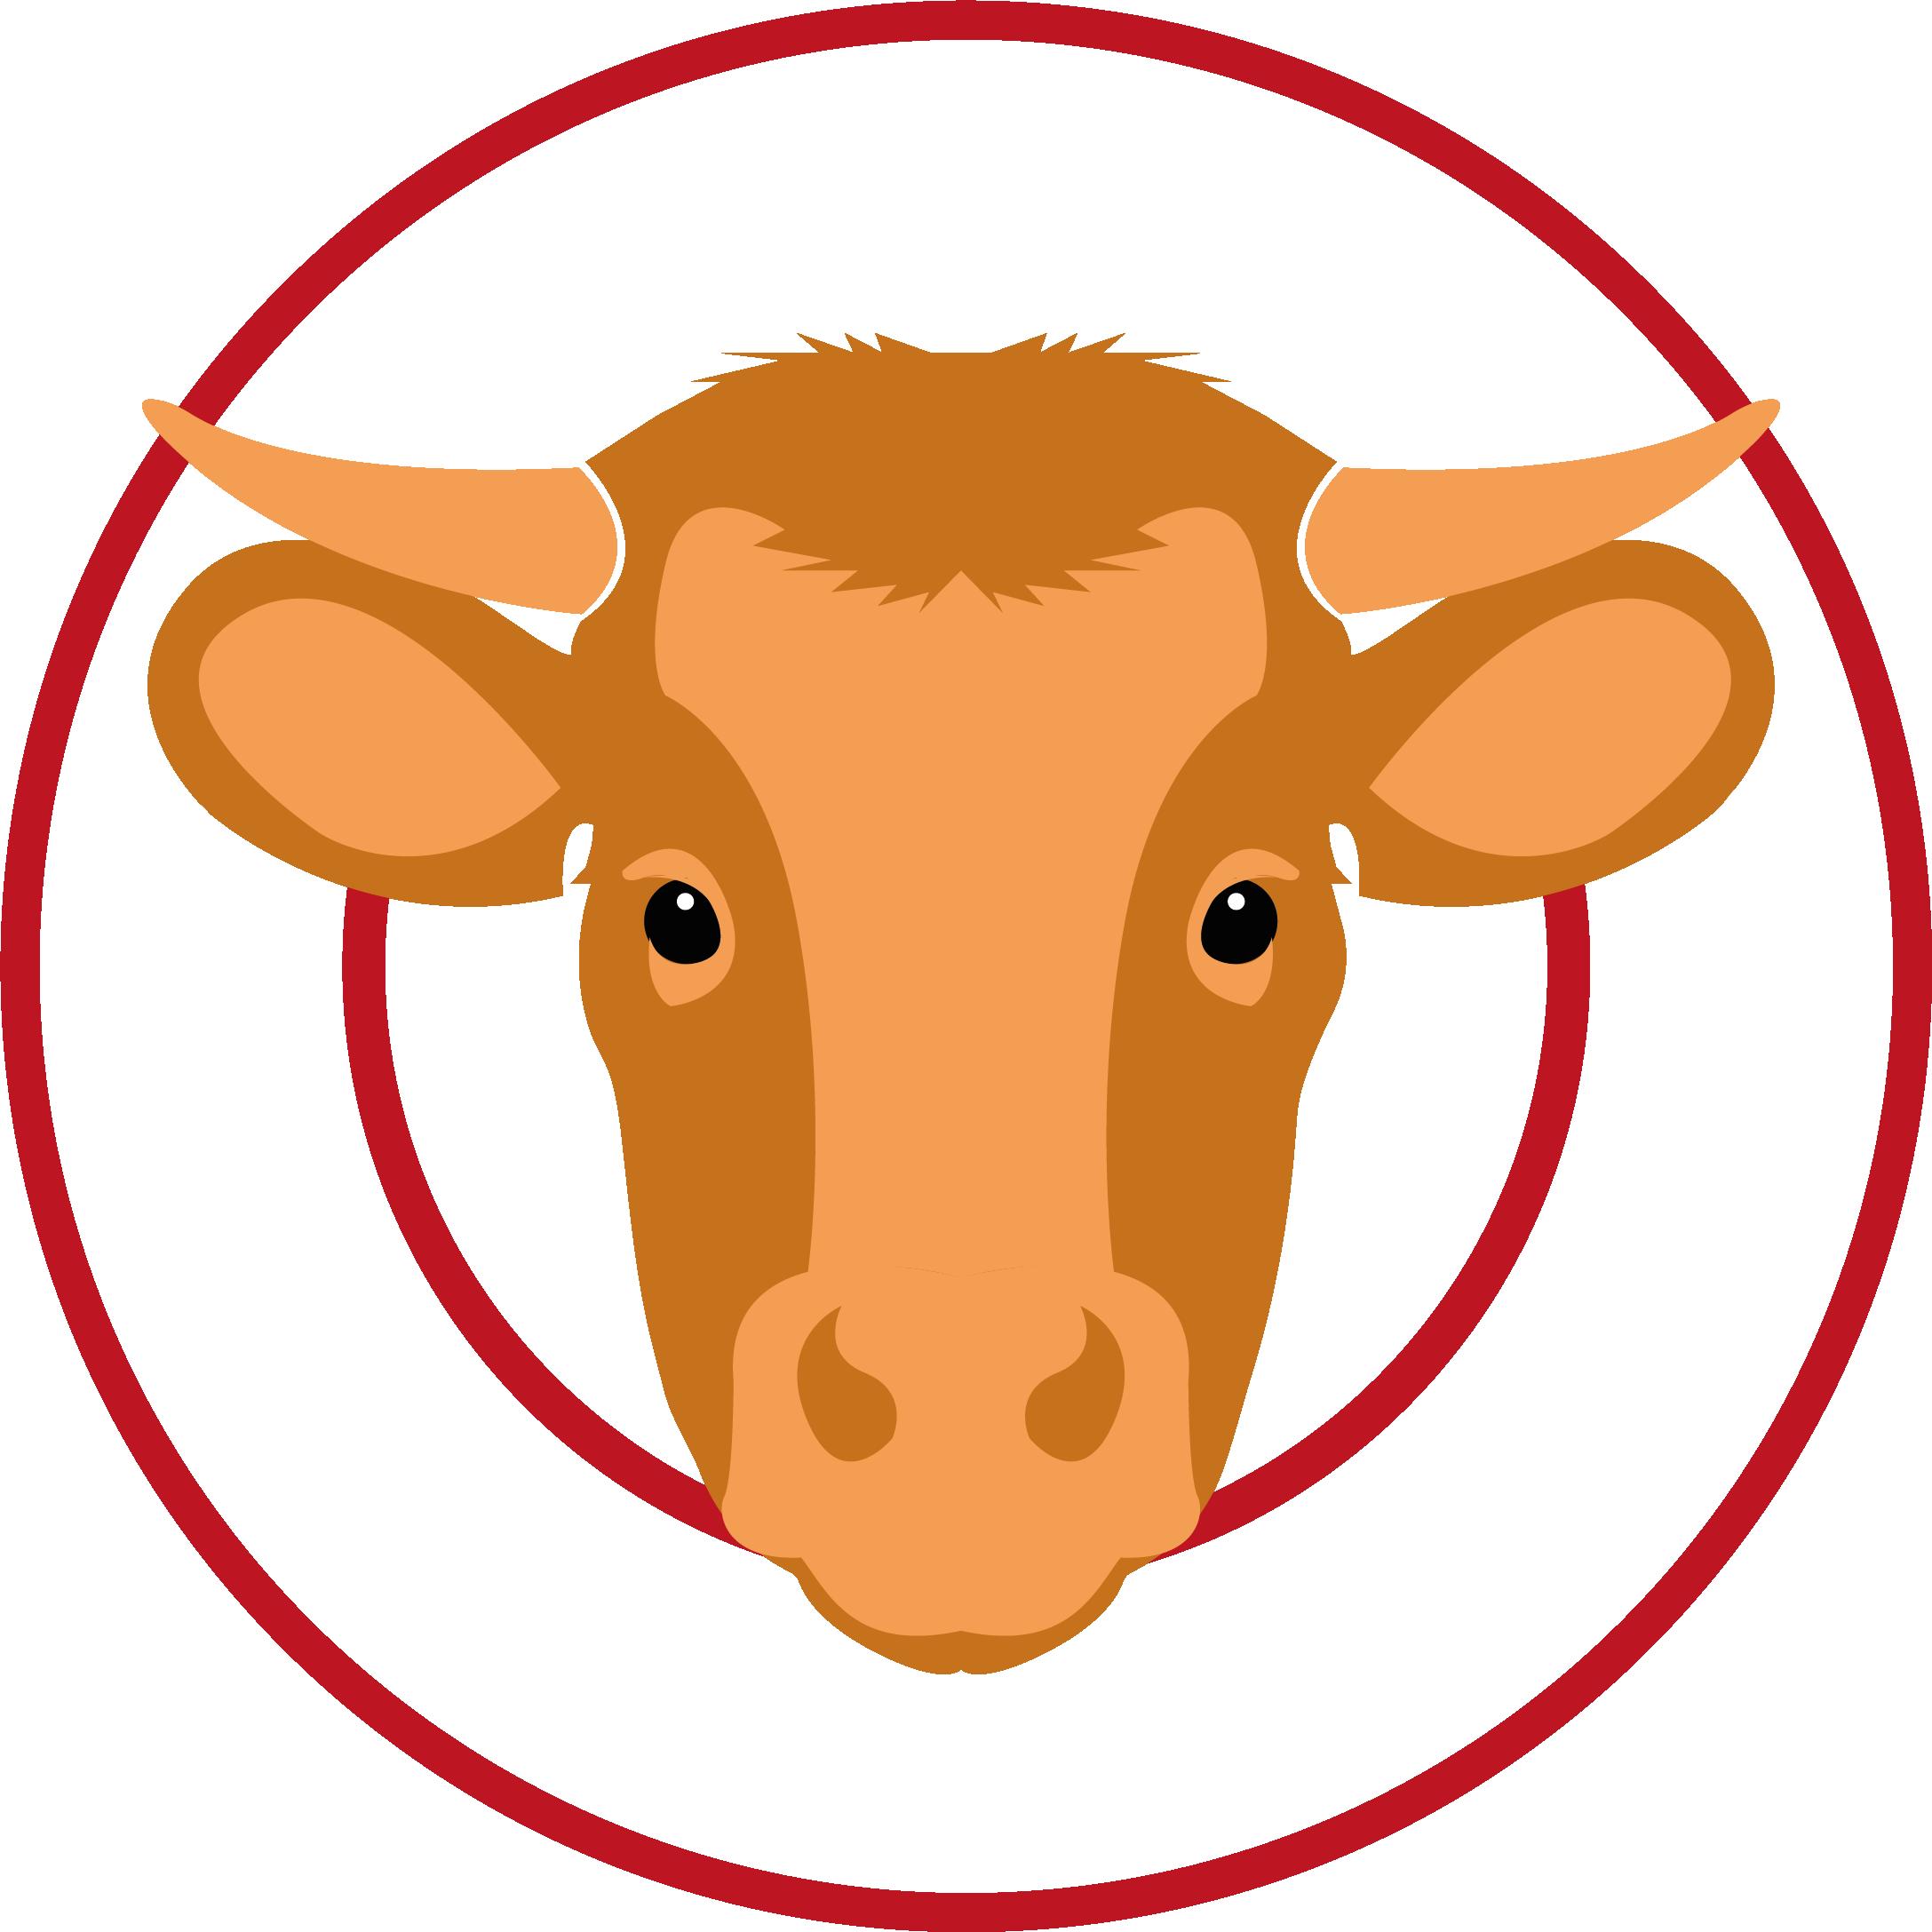 SARL Darras